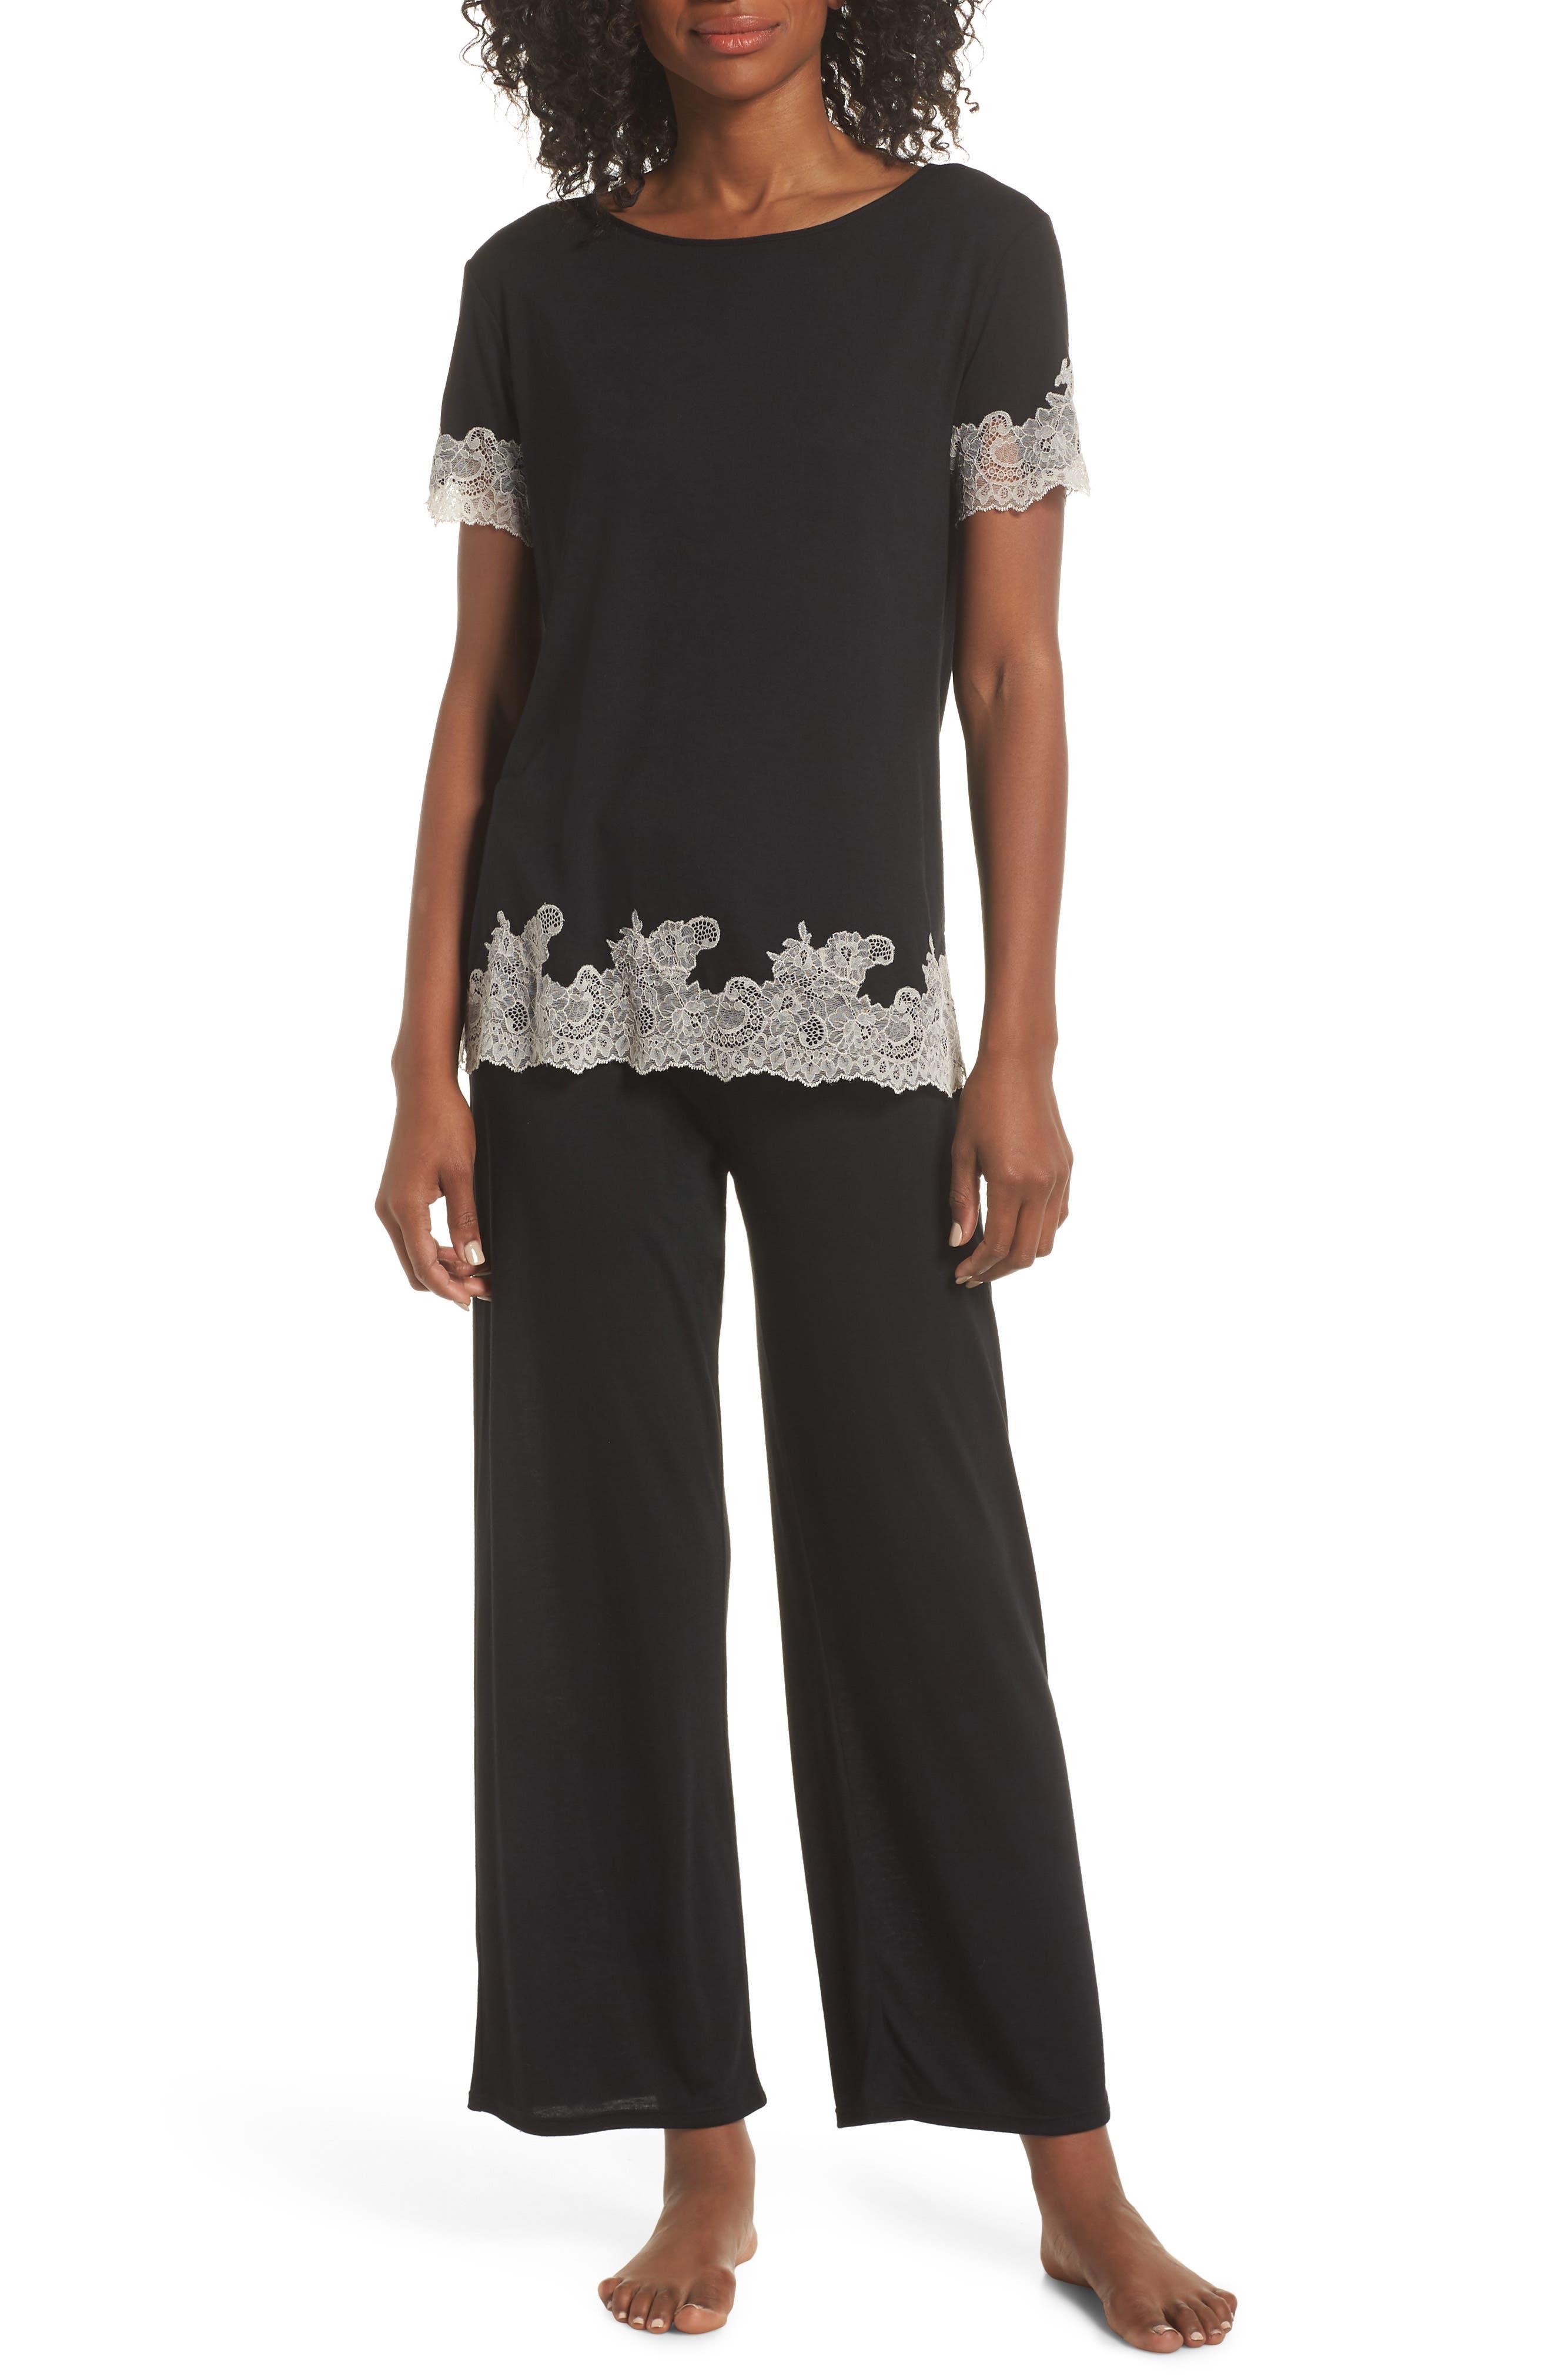 Luxe Shangri-La Pajamas,                             Main thumbnail 1, color,                             BLACK/ COCOON